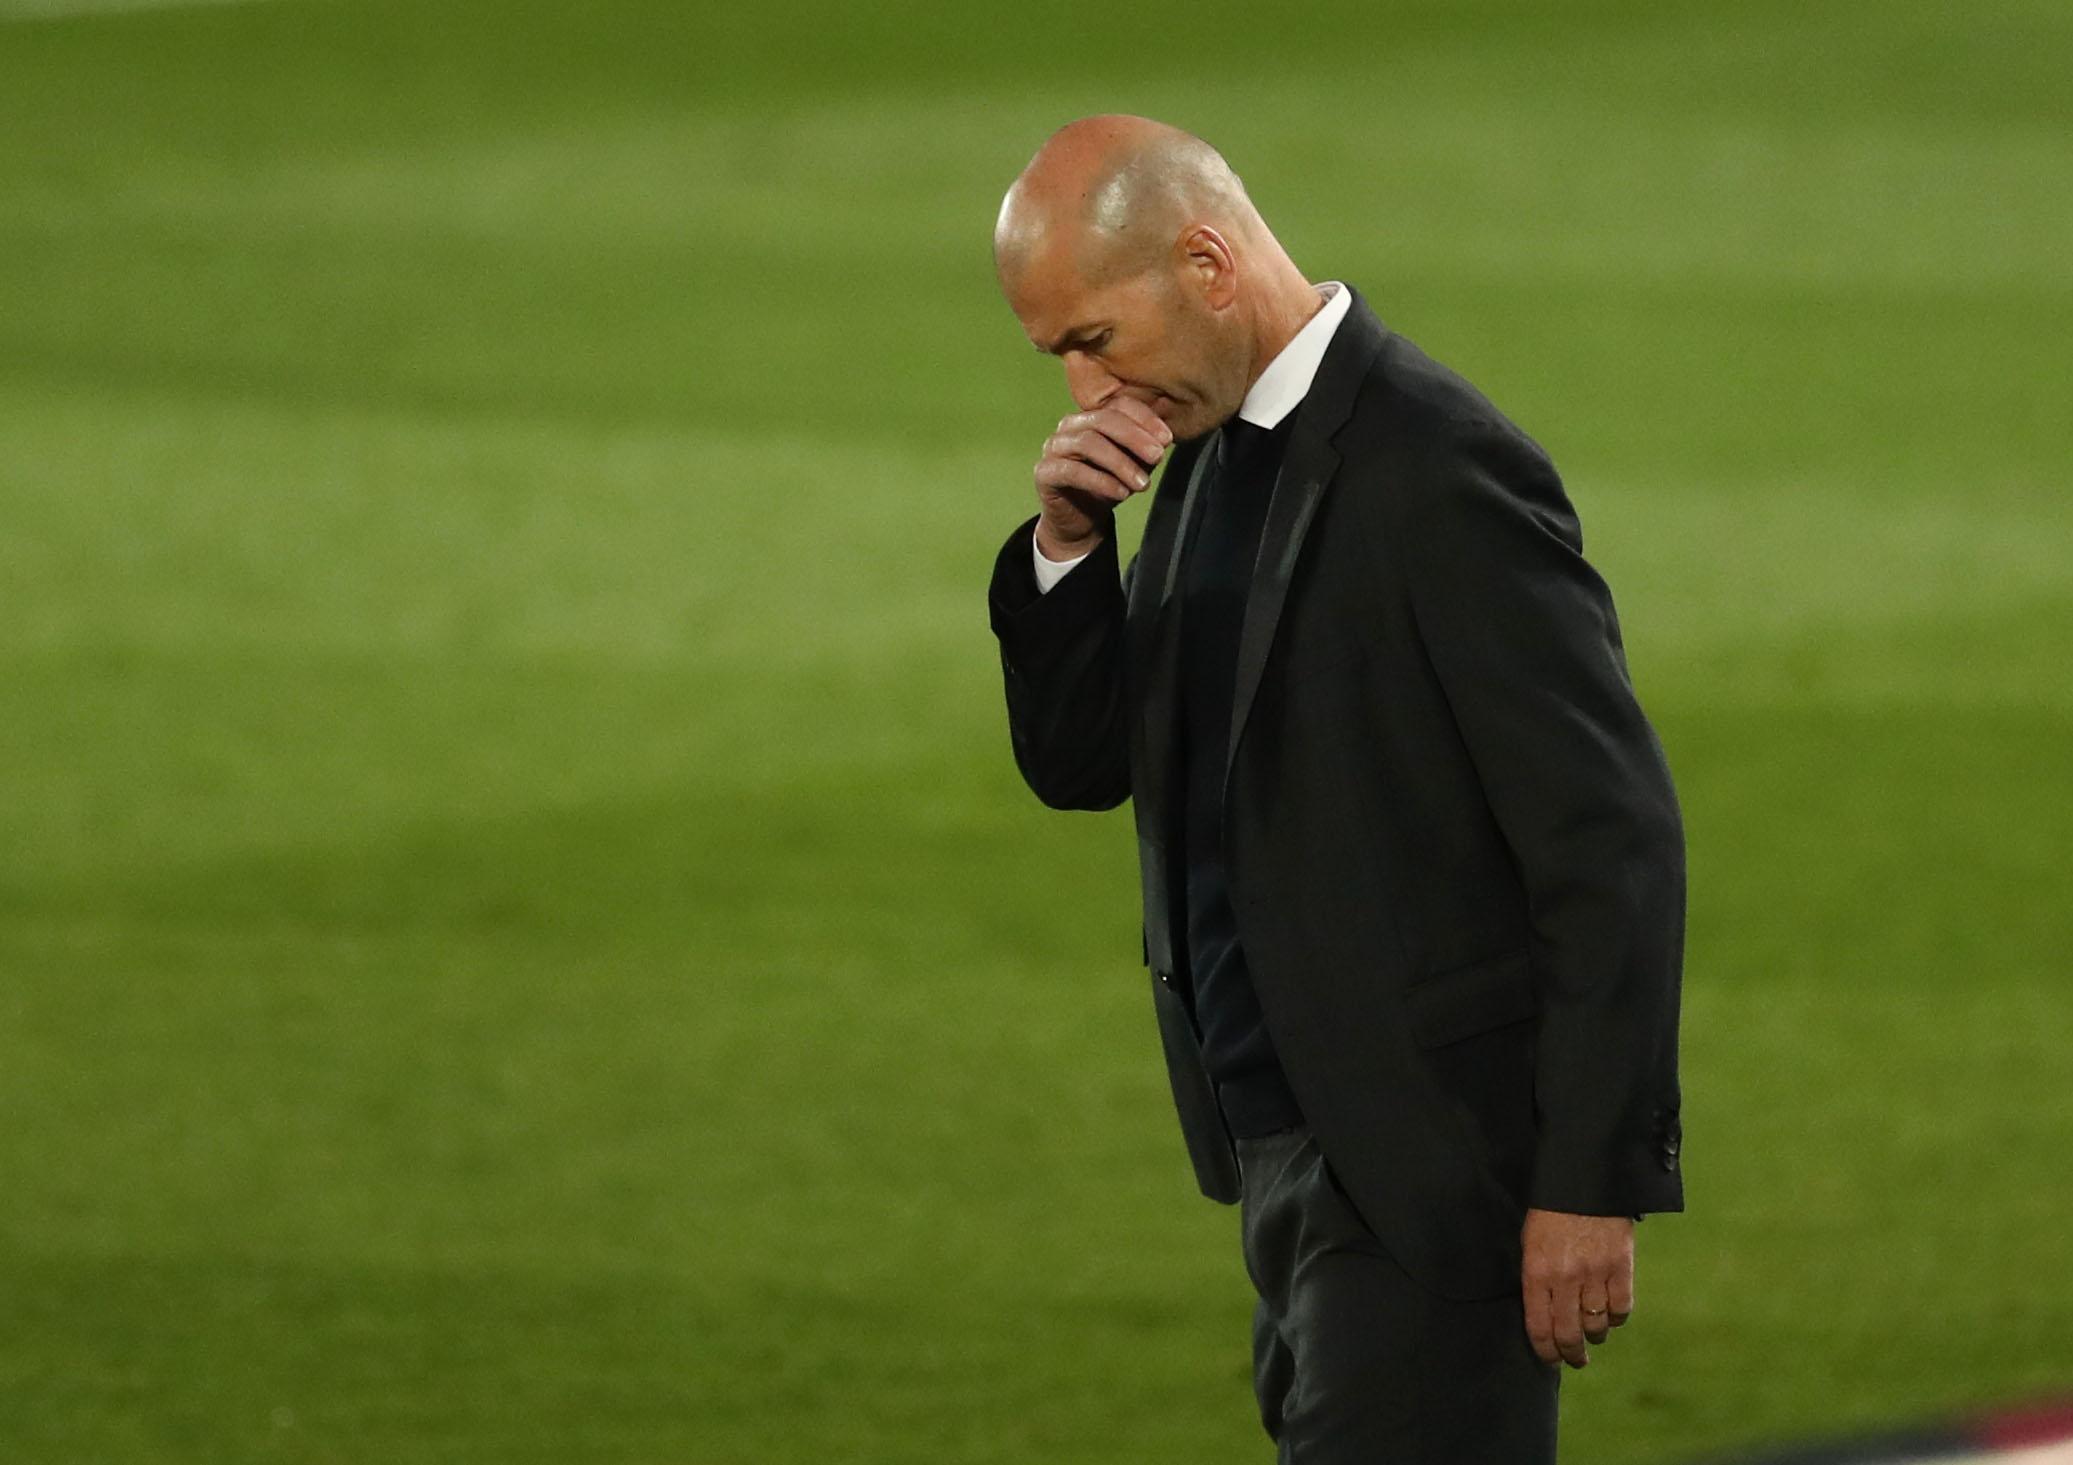 Real-Abgang fix? Zidane soll sich bereits verabschiedet haben